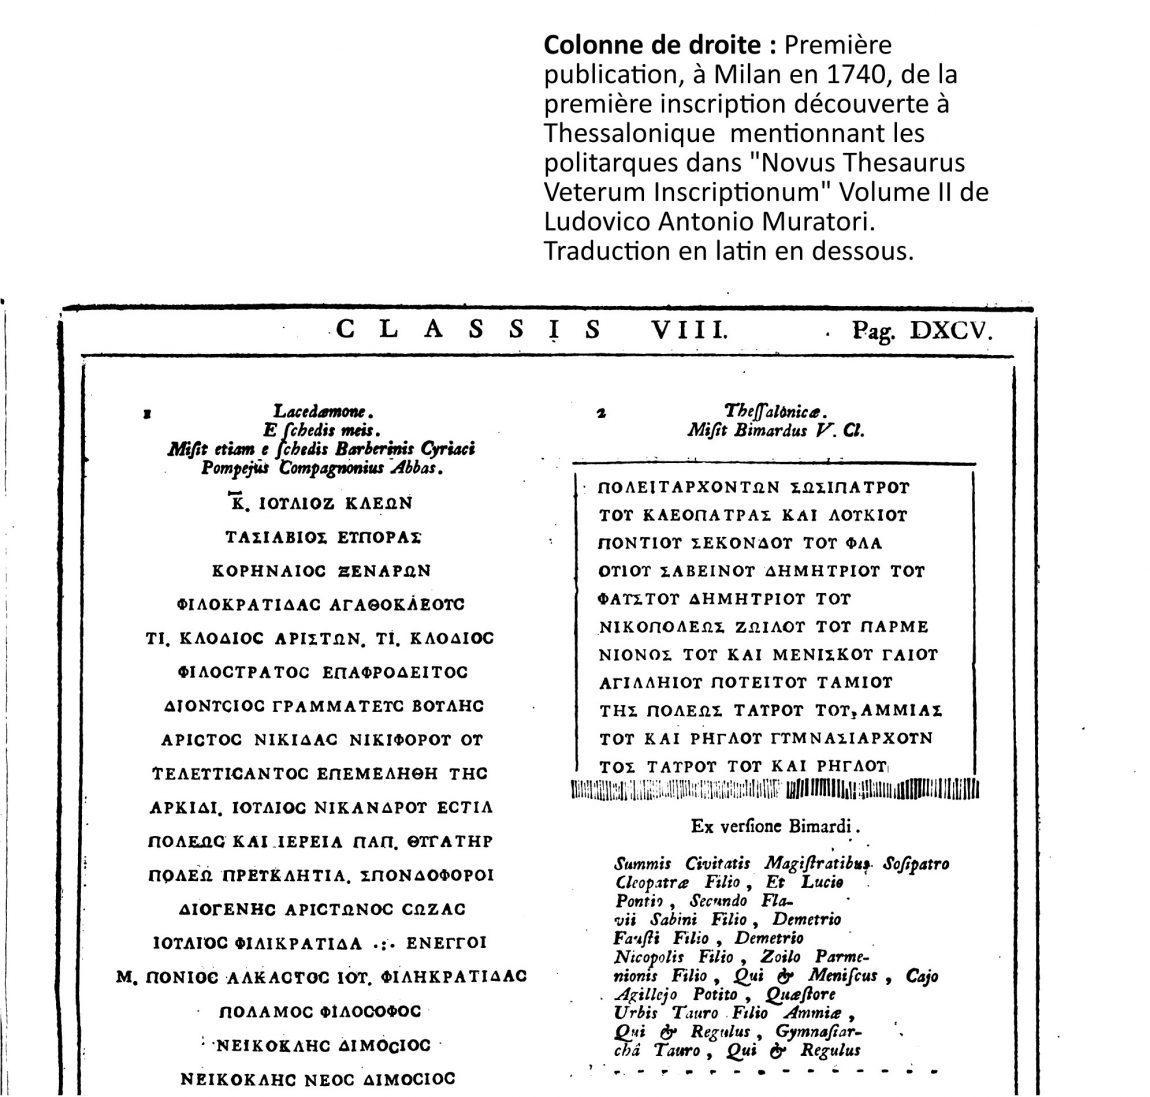 1740 publication muratori